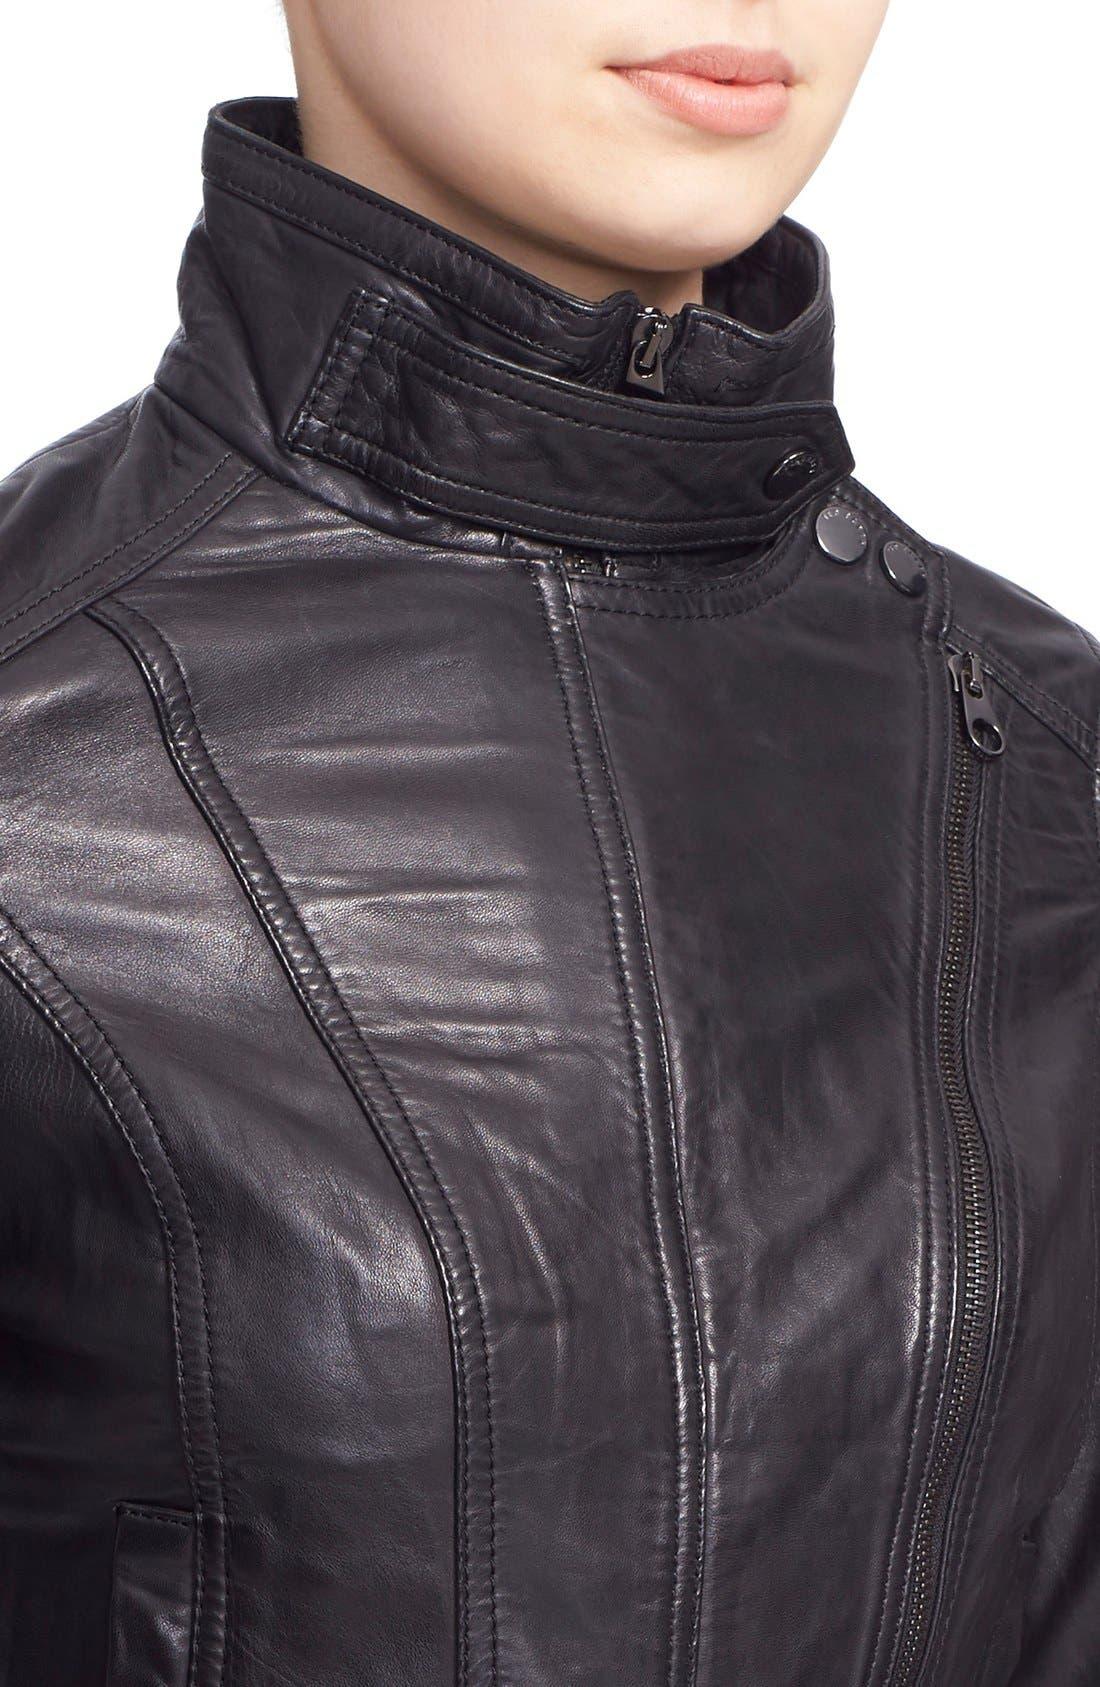 TED BAKER LONDON, 'Roark' Stand Collar Leather Jacket, Alternate thumbnail 4, color, 001